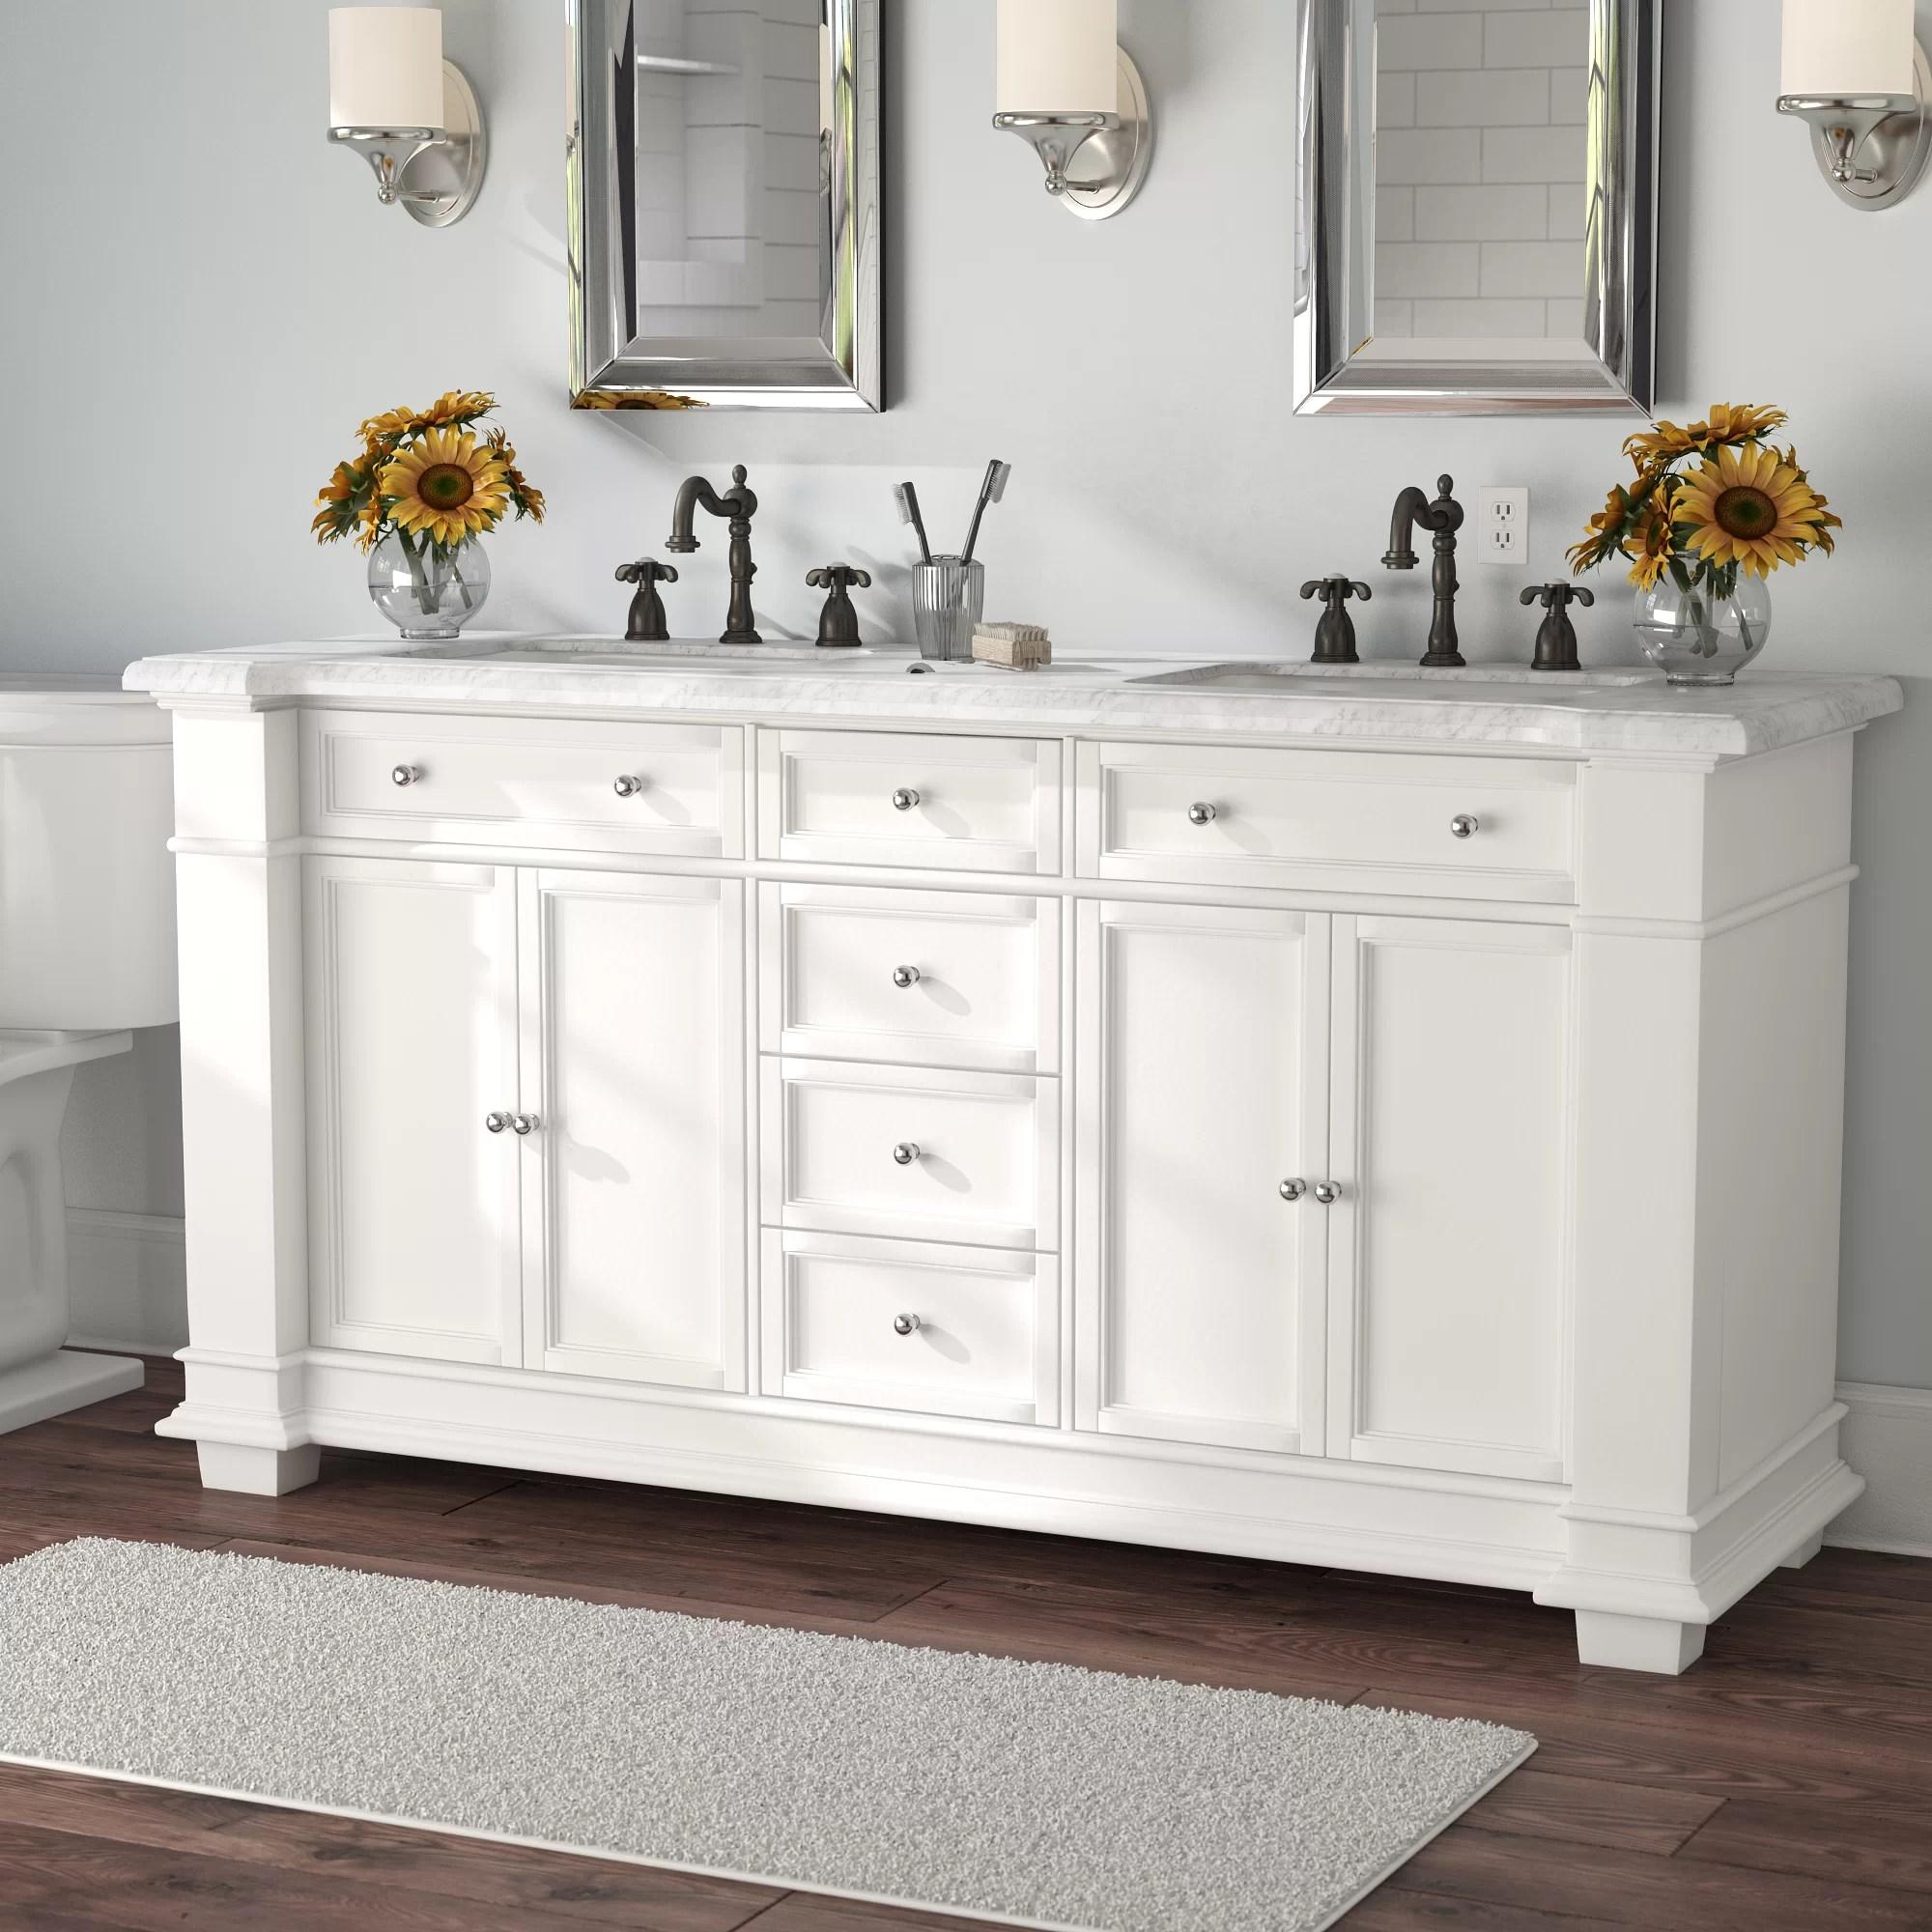 72 inch white bathroom vanities you ll